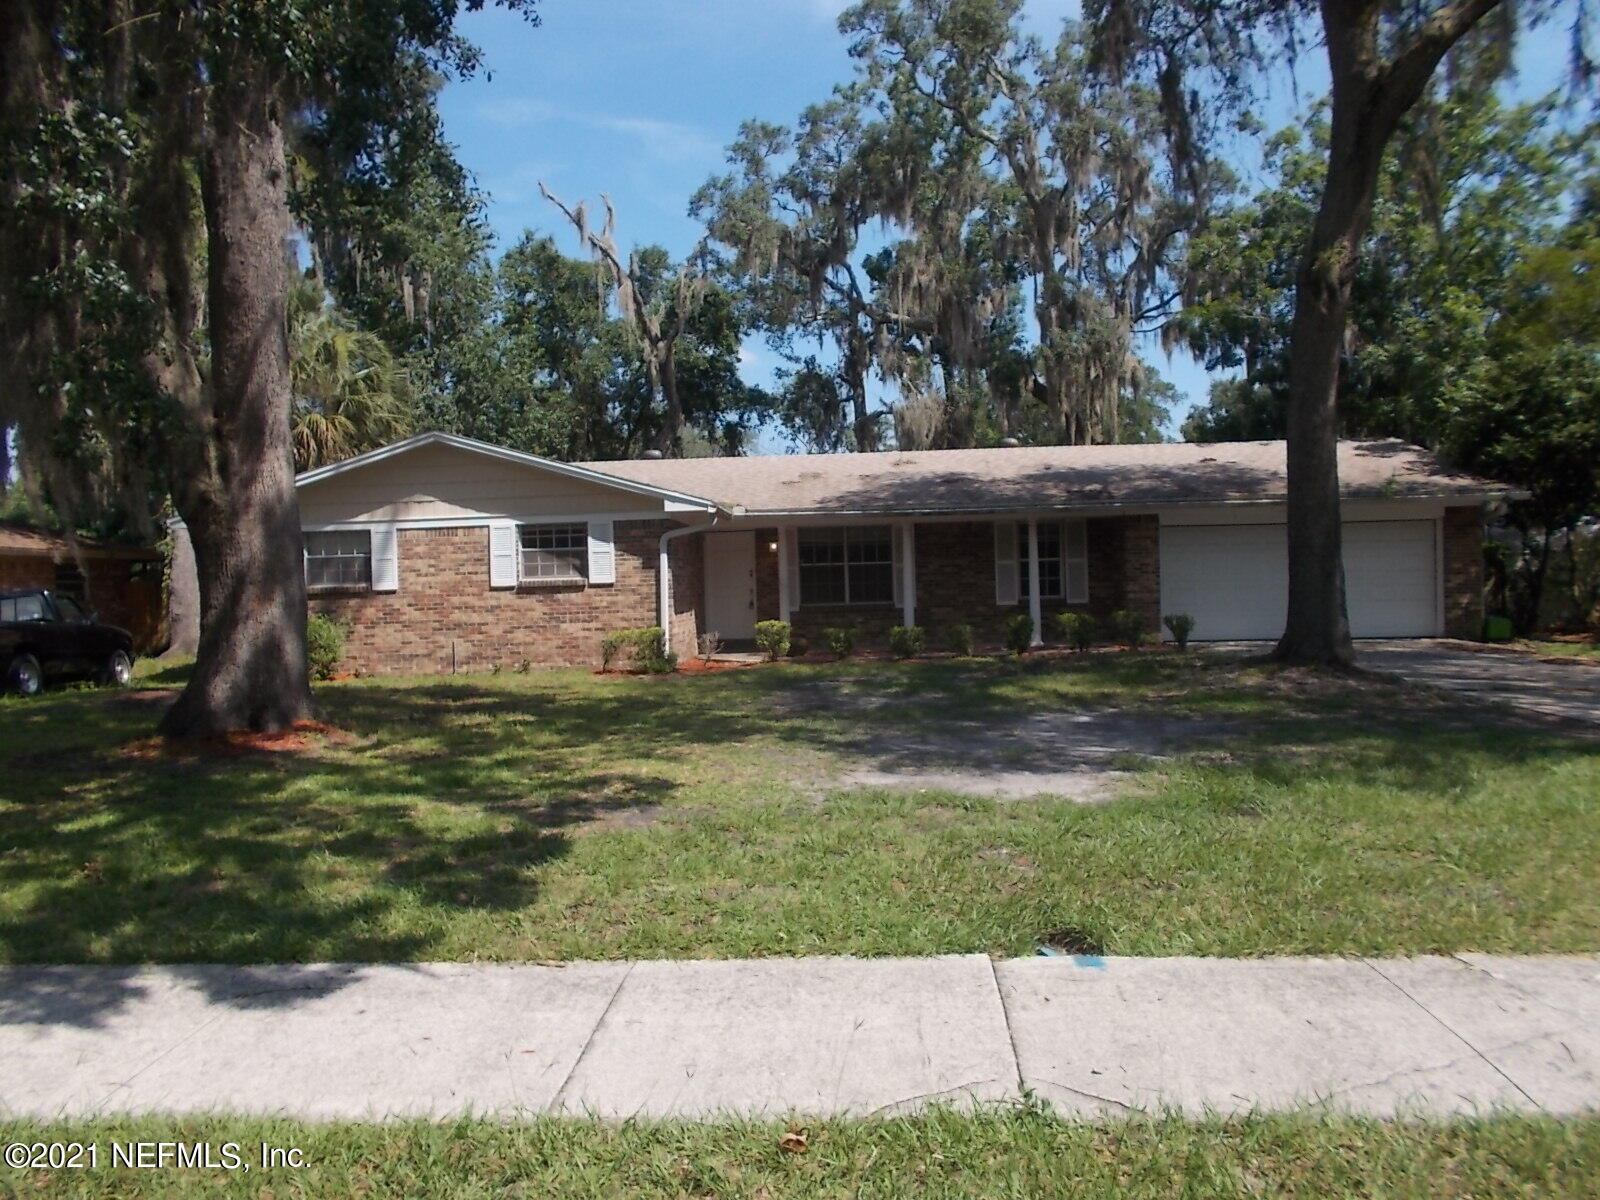 2355 MOODY, ORANGE PARK, FLORIDA 32073, 4 Bedrooms Bedrooms, ,2 BathroomsBathrooms,Residential,For sale,MOODY,1115458